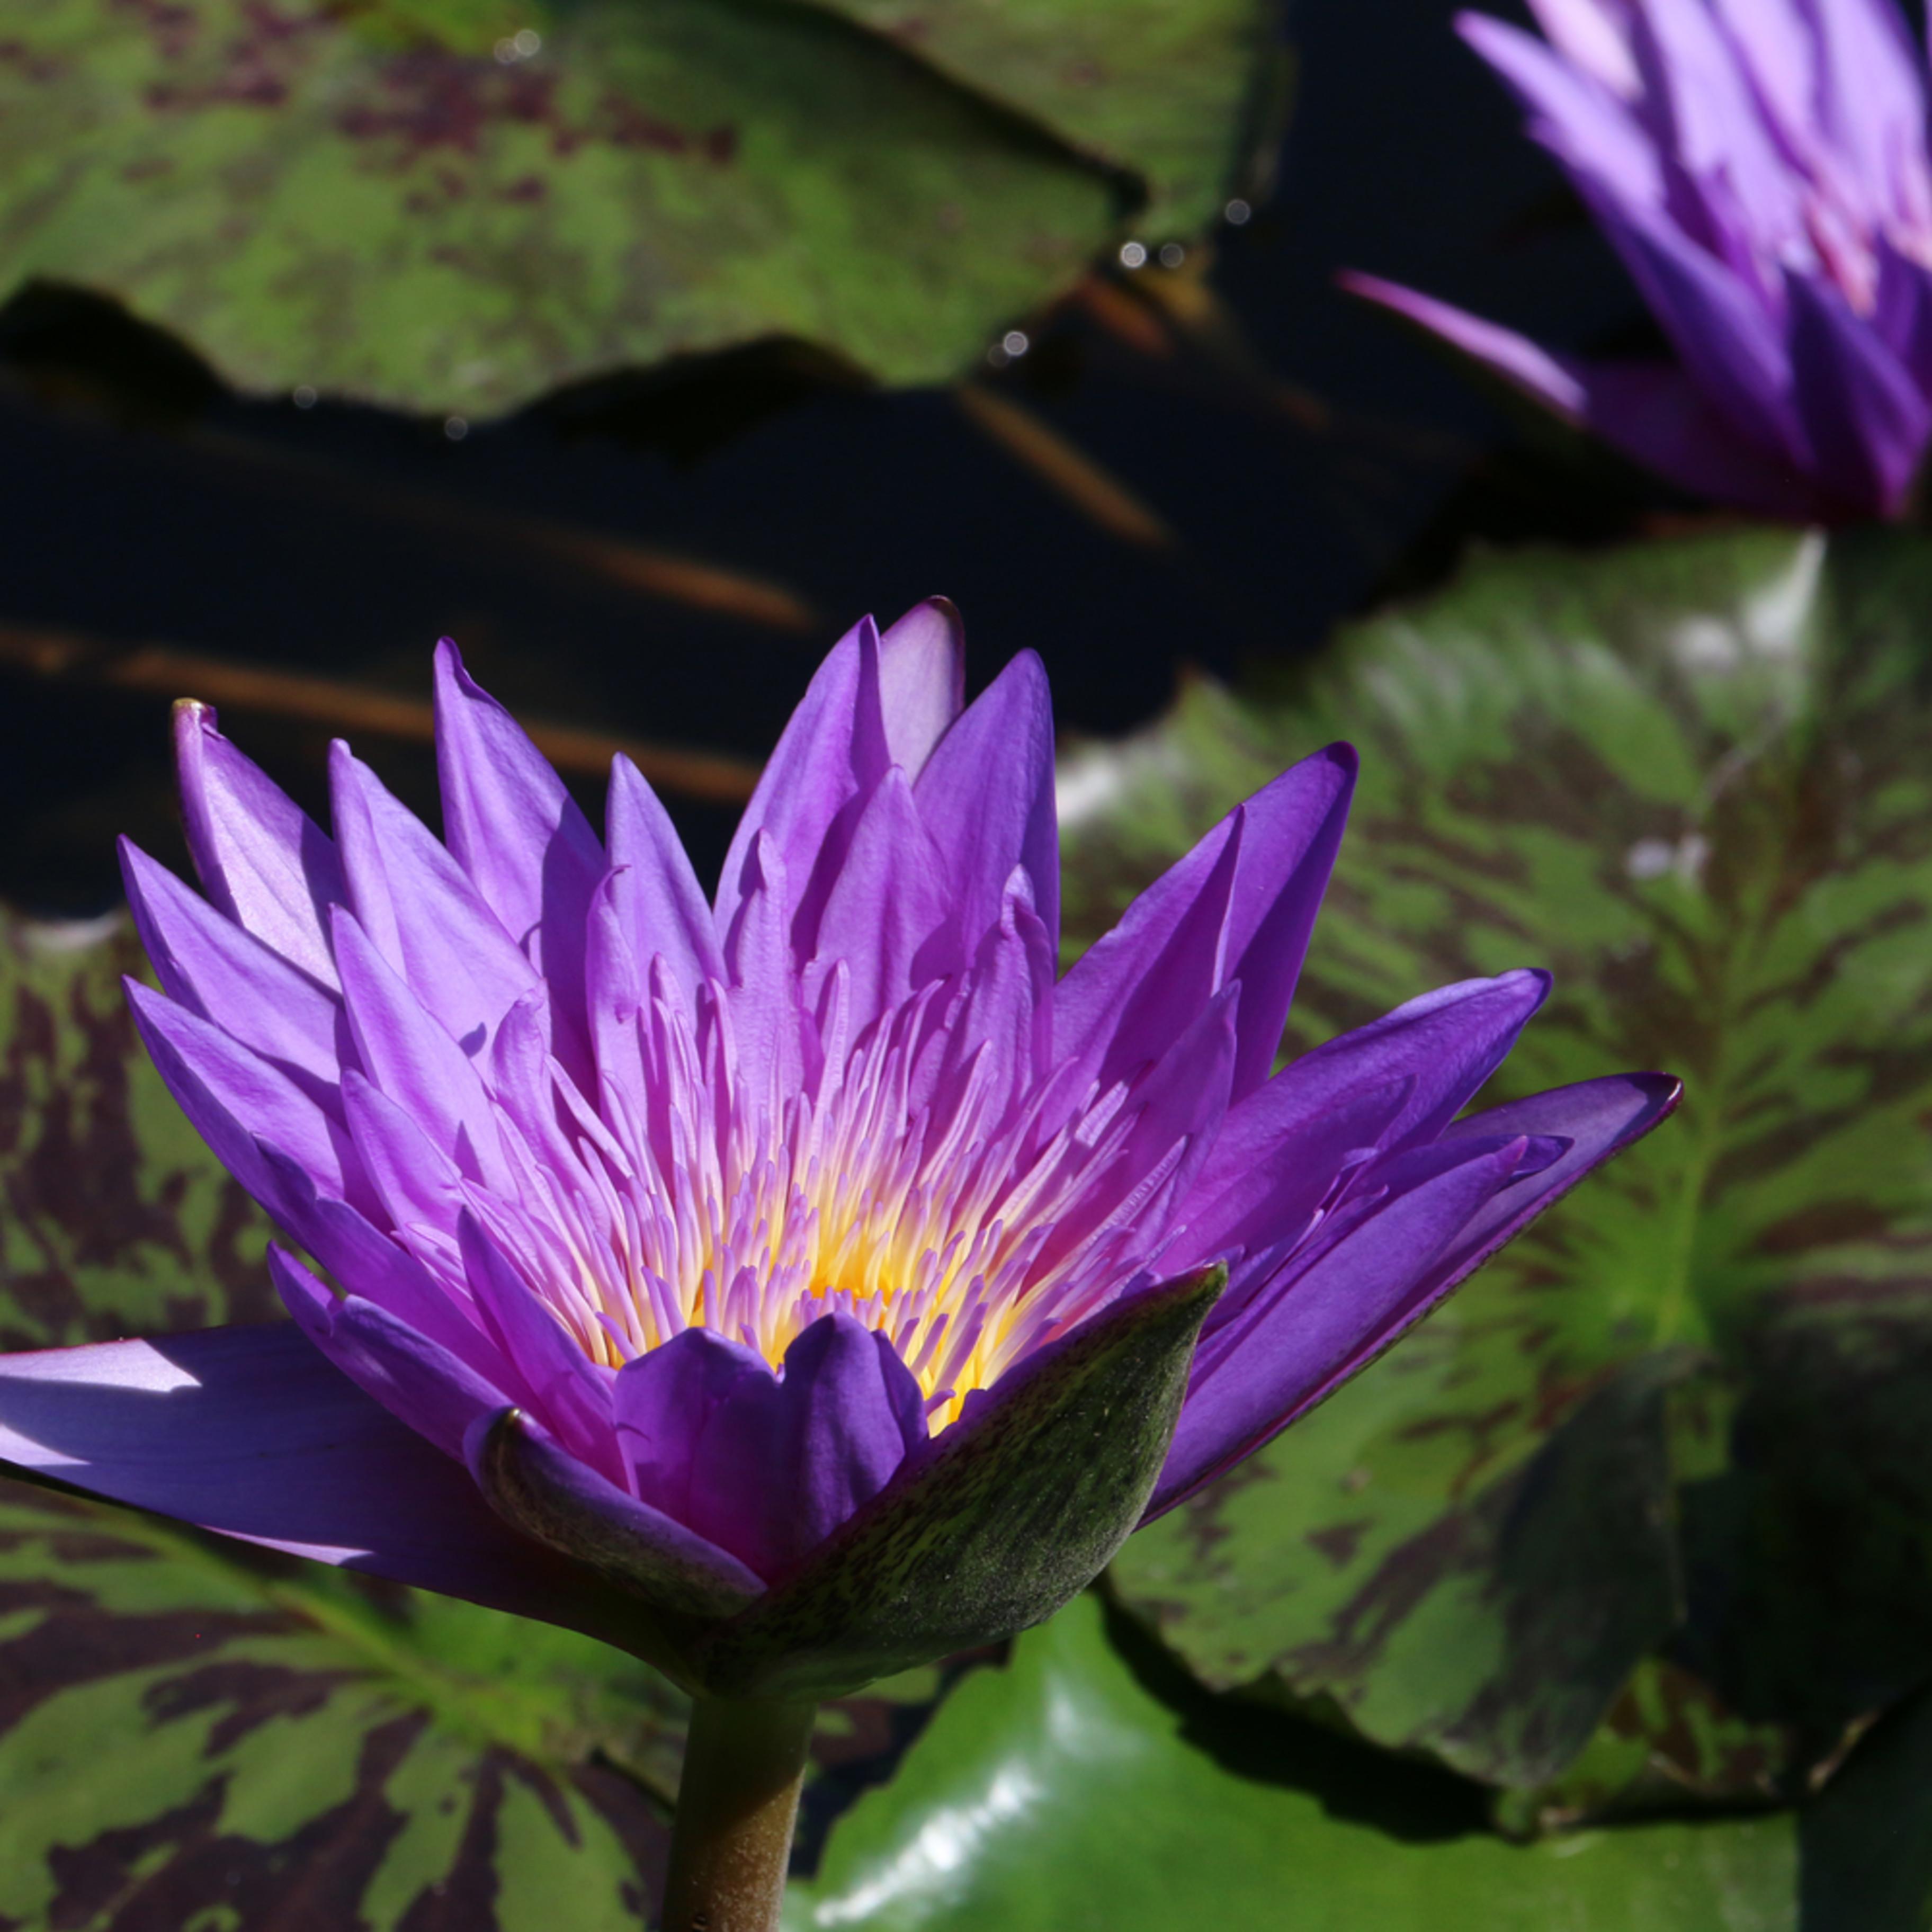 Purplewaterlily 7788 mfqf7i